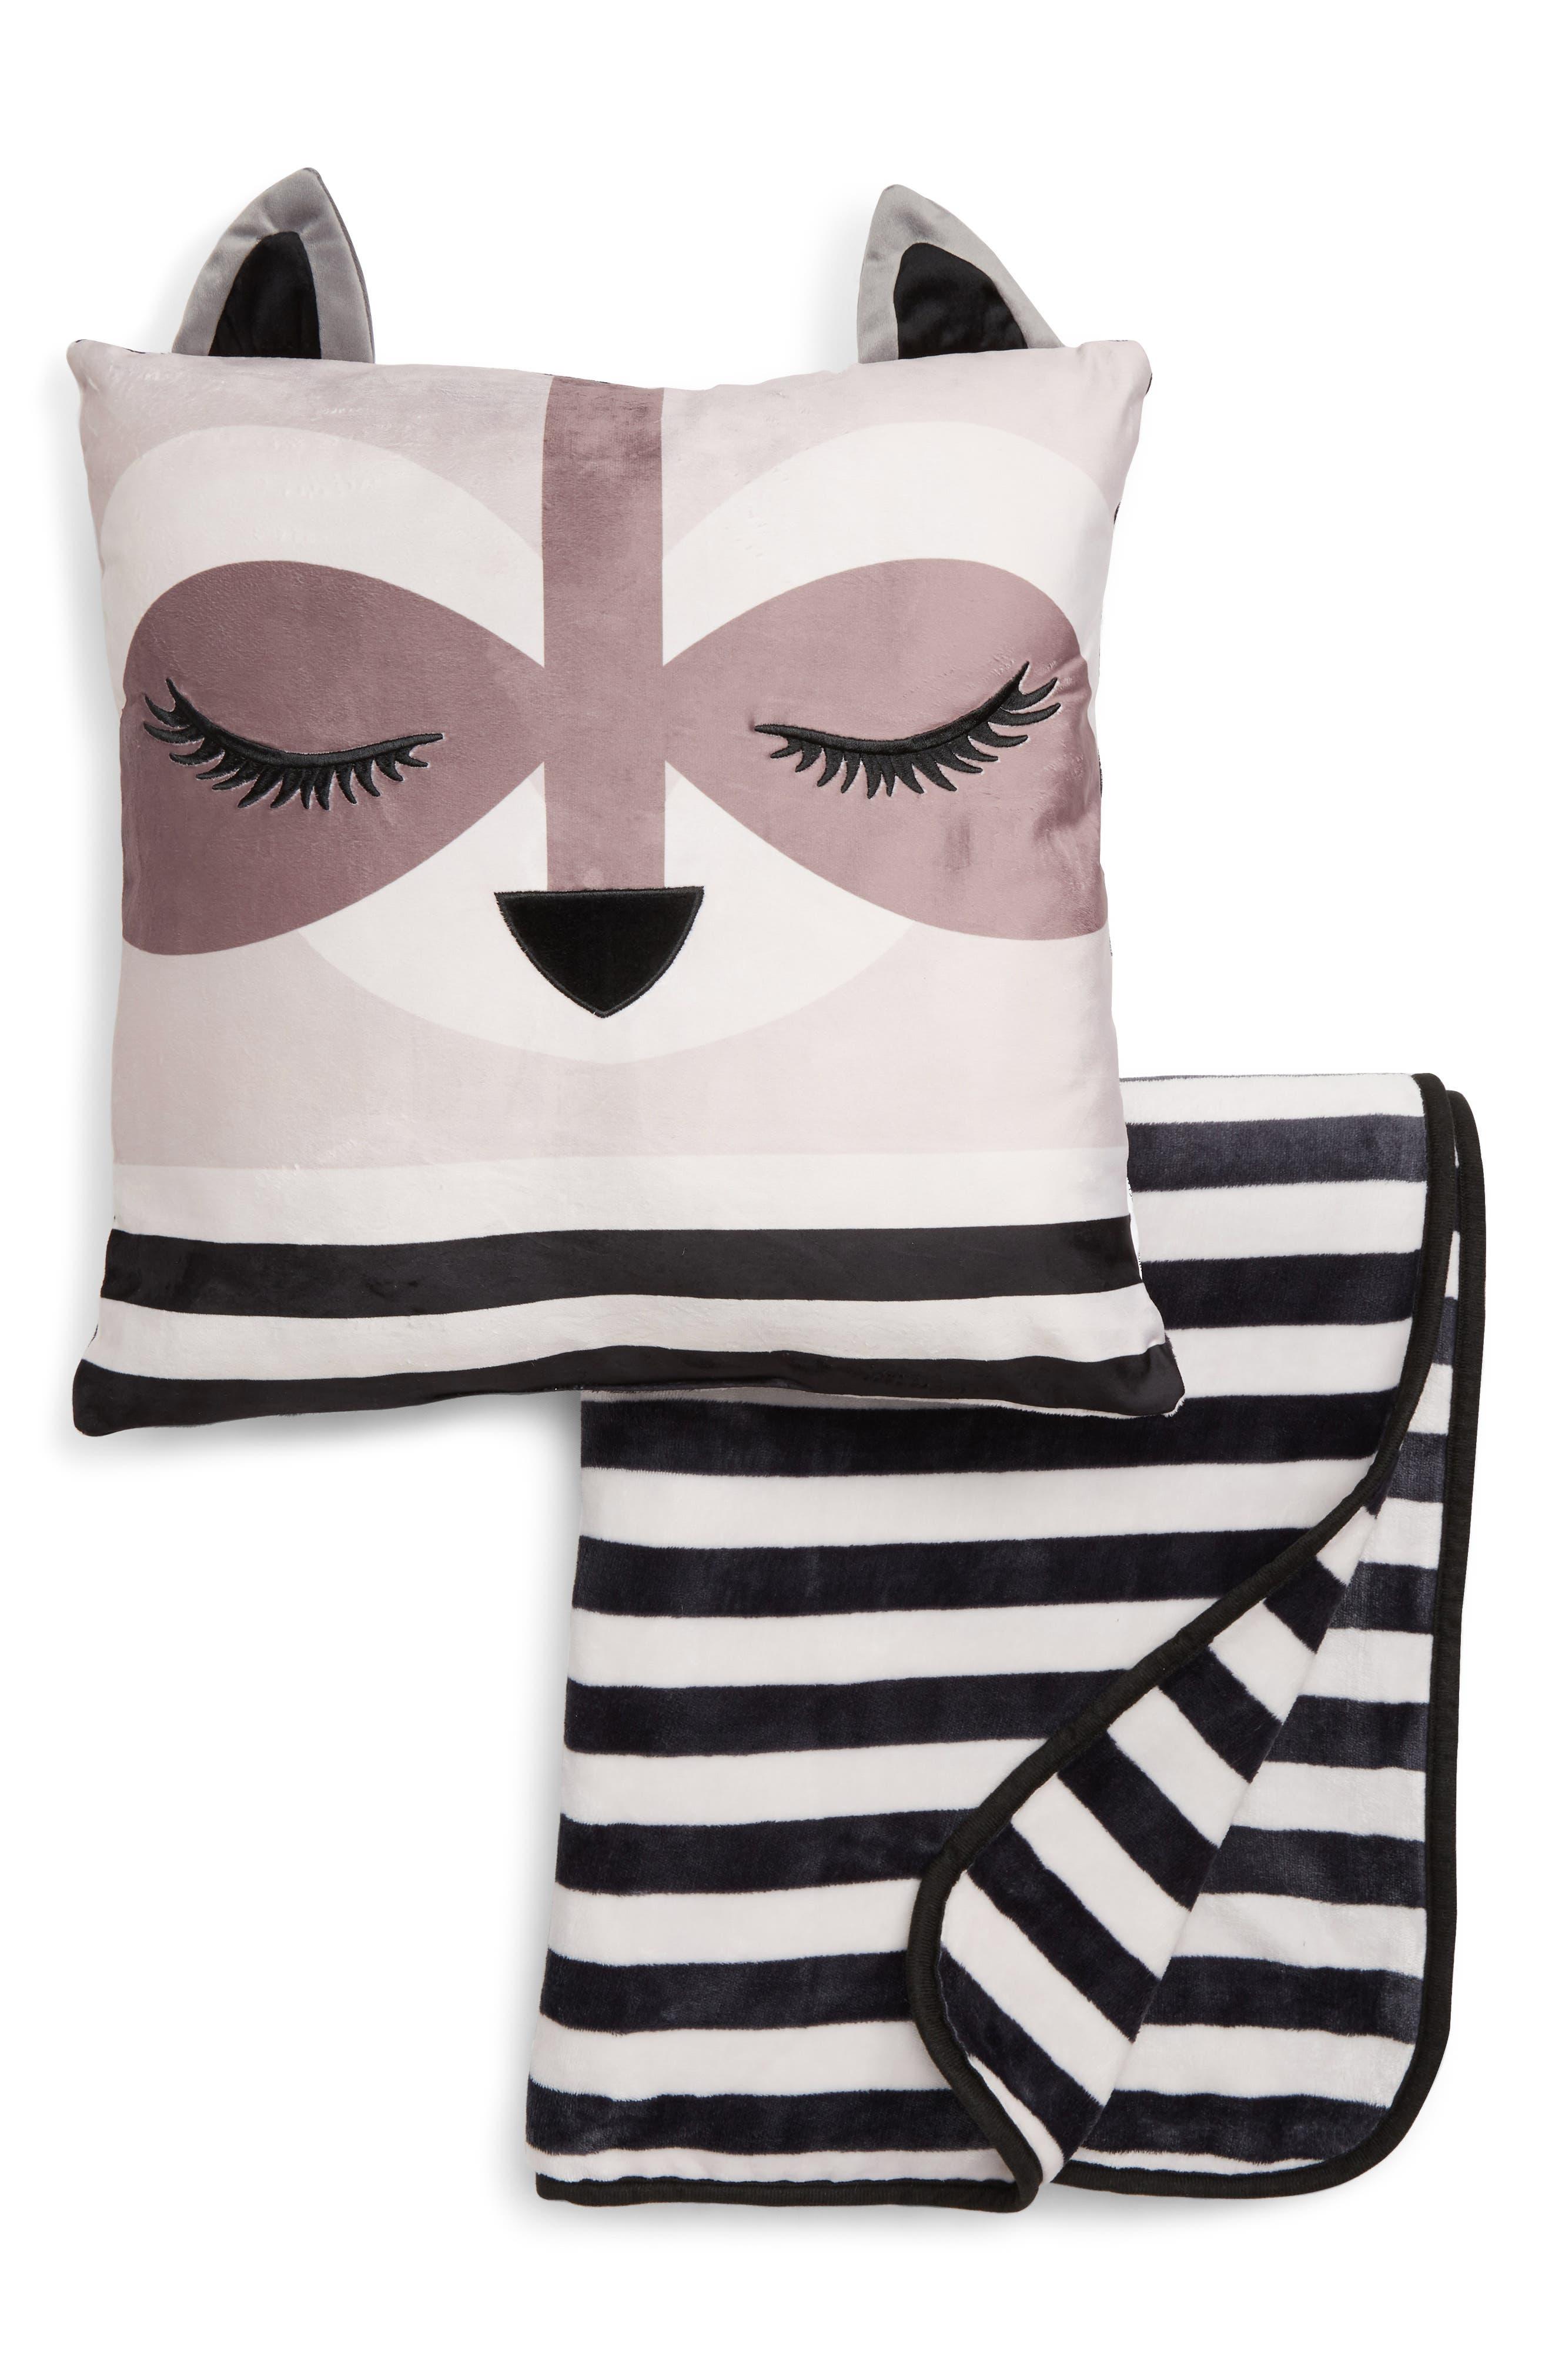 Raccoon Pillow & Blanket Set,                         Main,                         color, RACCOON